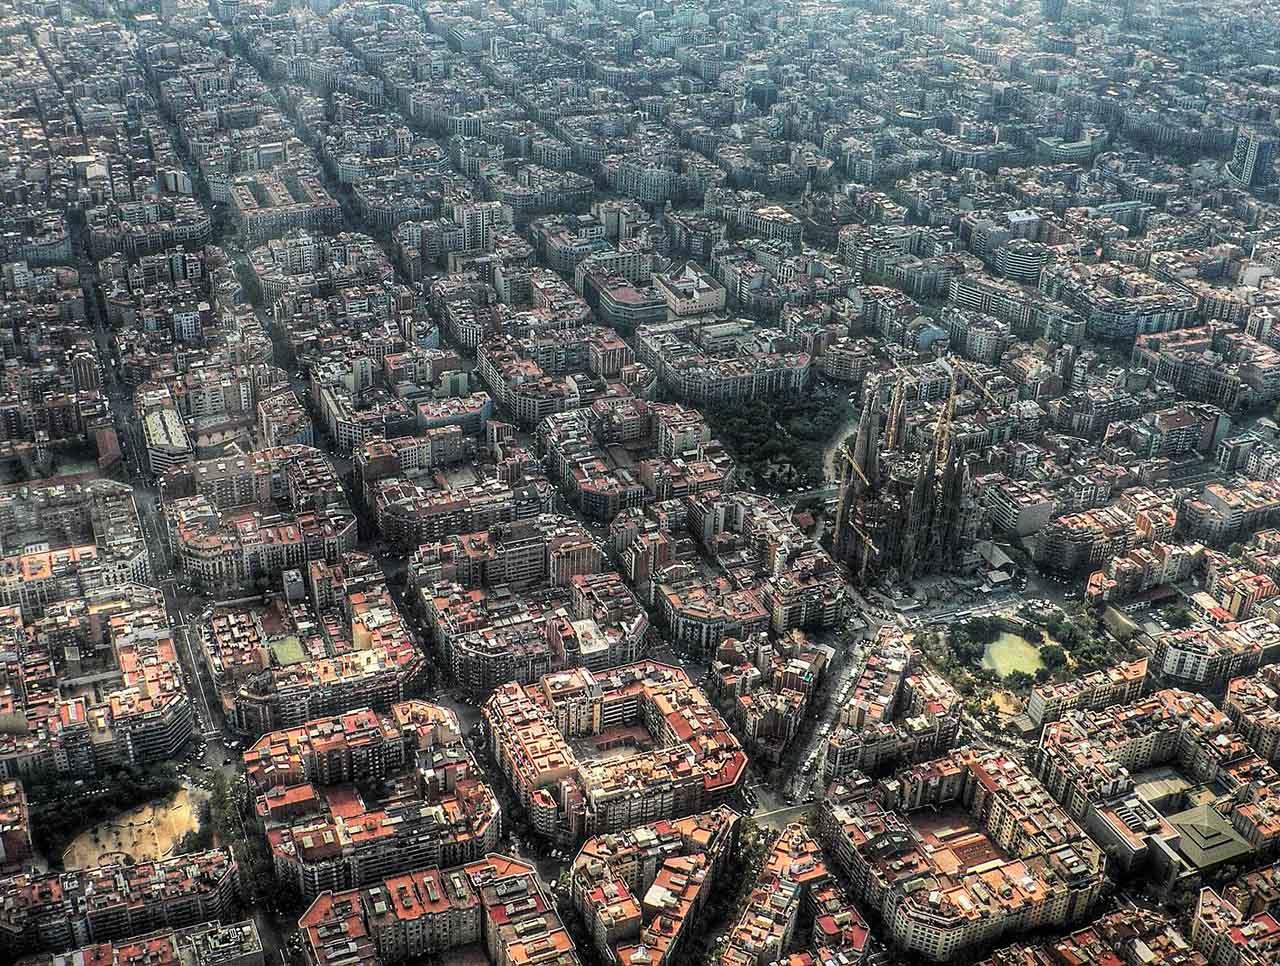 Barcelona City Wallpapers HD - Wallpaper Cave